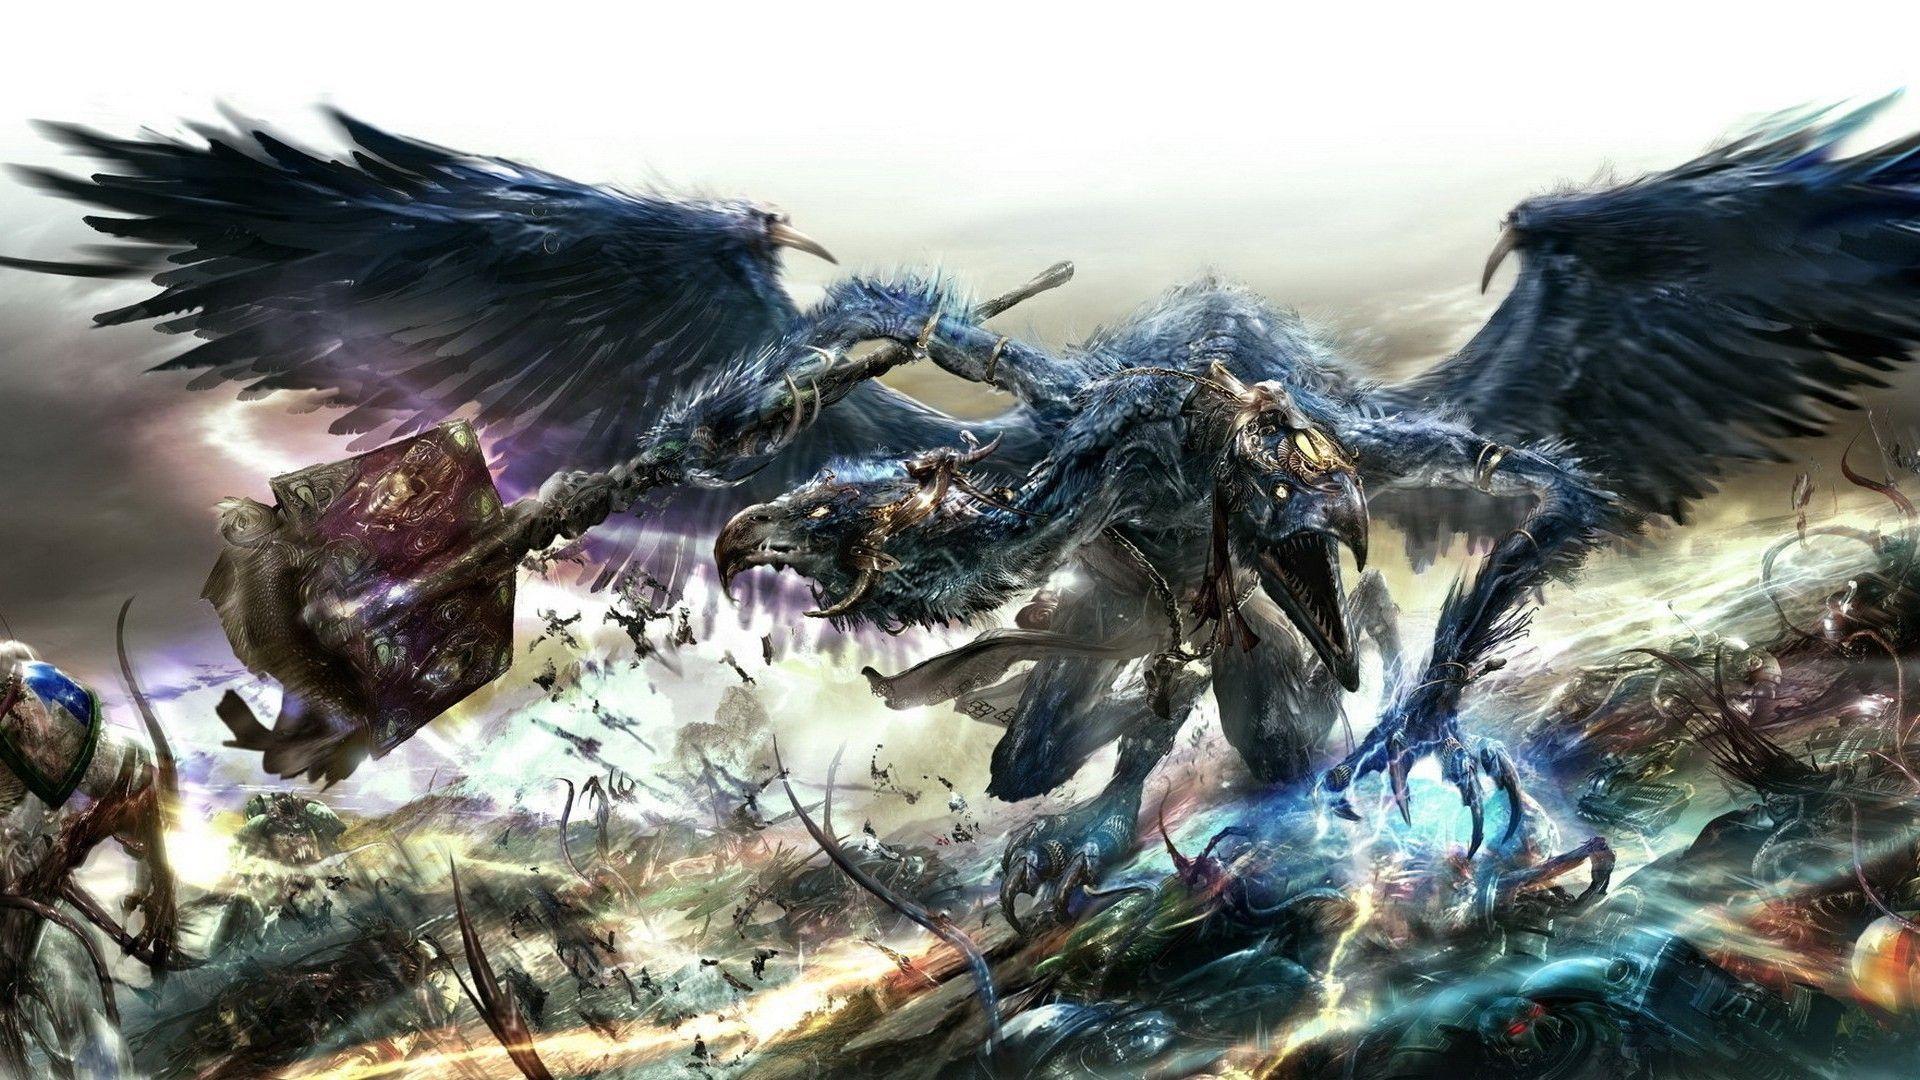 91 Warhammer 40k Wallpapers   Warhammer 40k Backgrounds